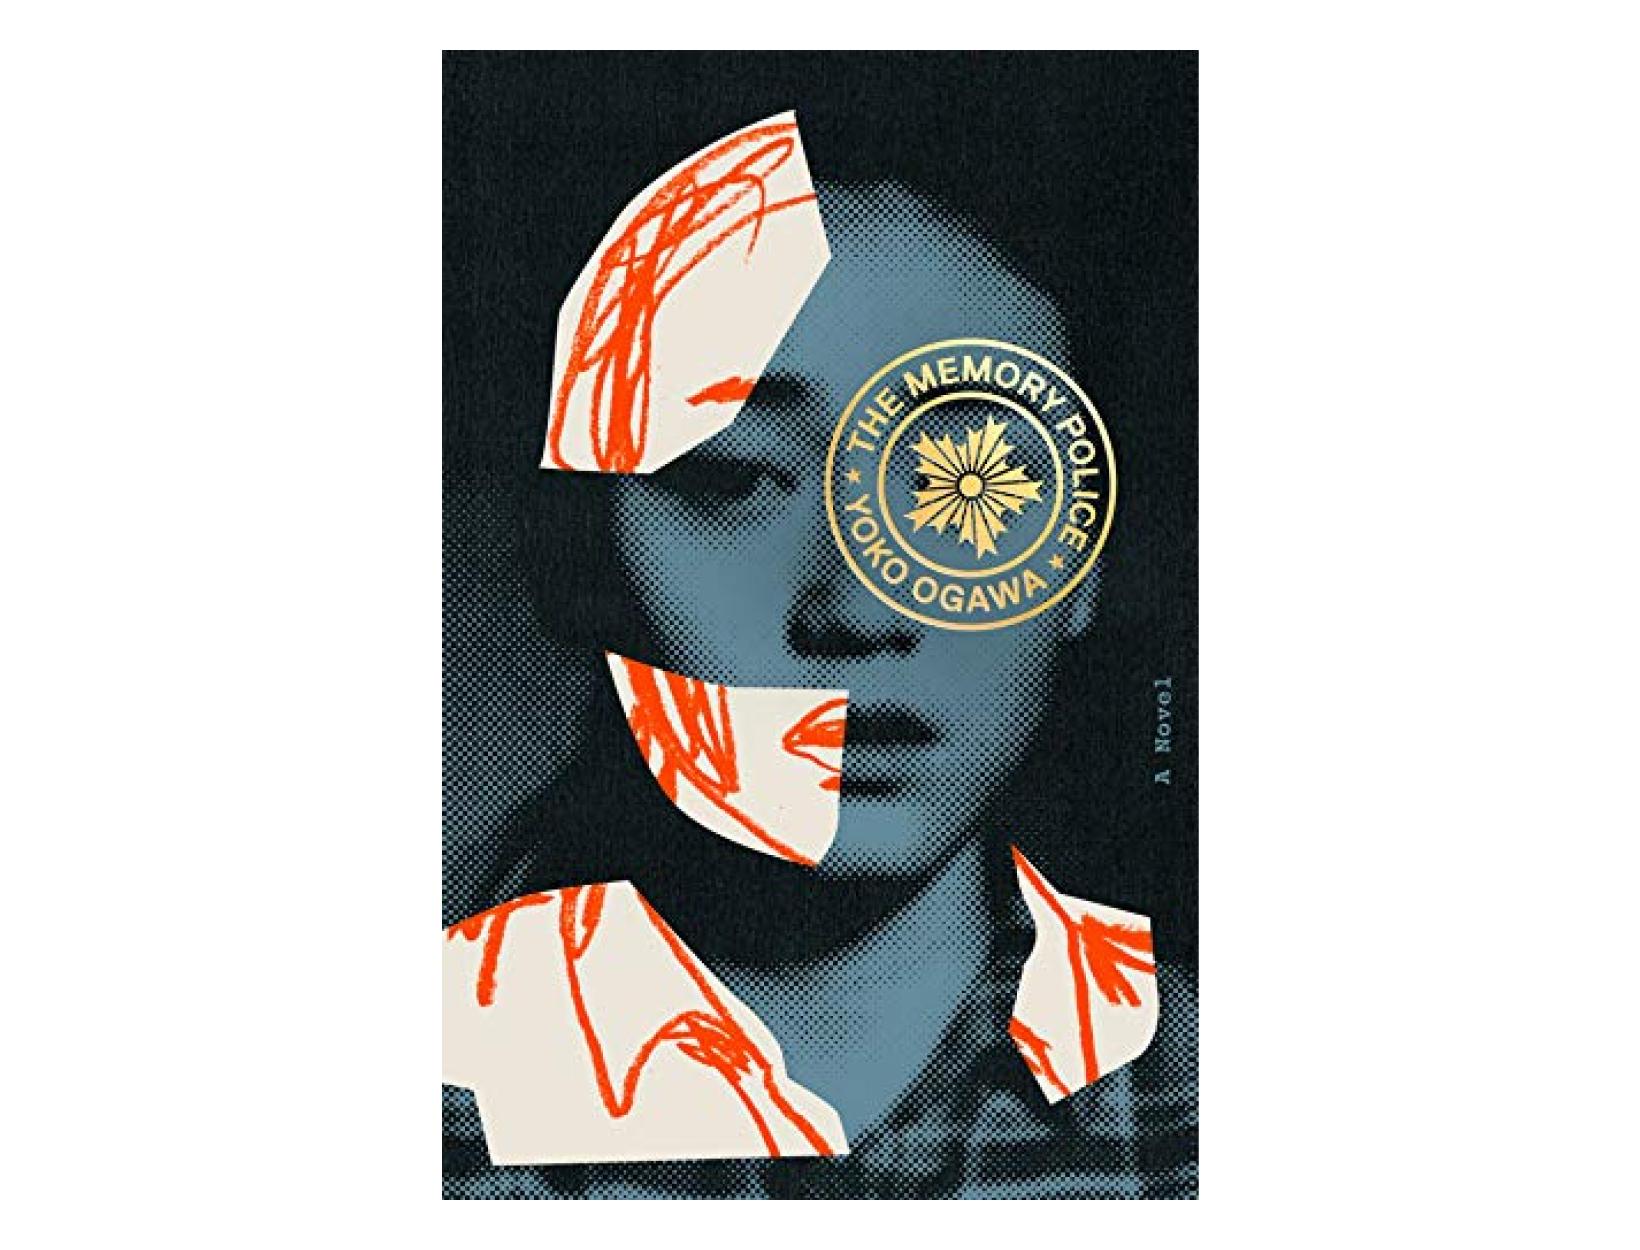 <em>The Memory Police</em> by Yoko Ogawa, translated by StephenSnyder